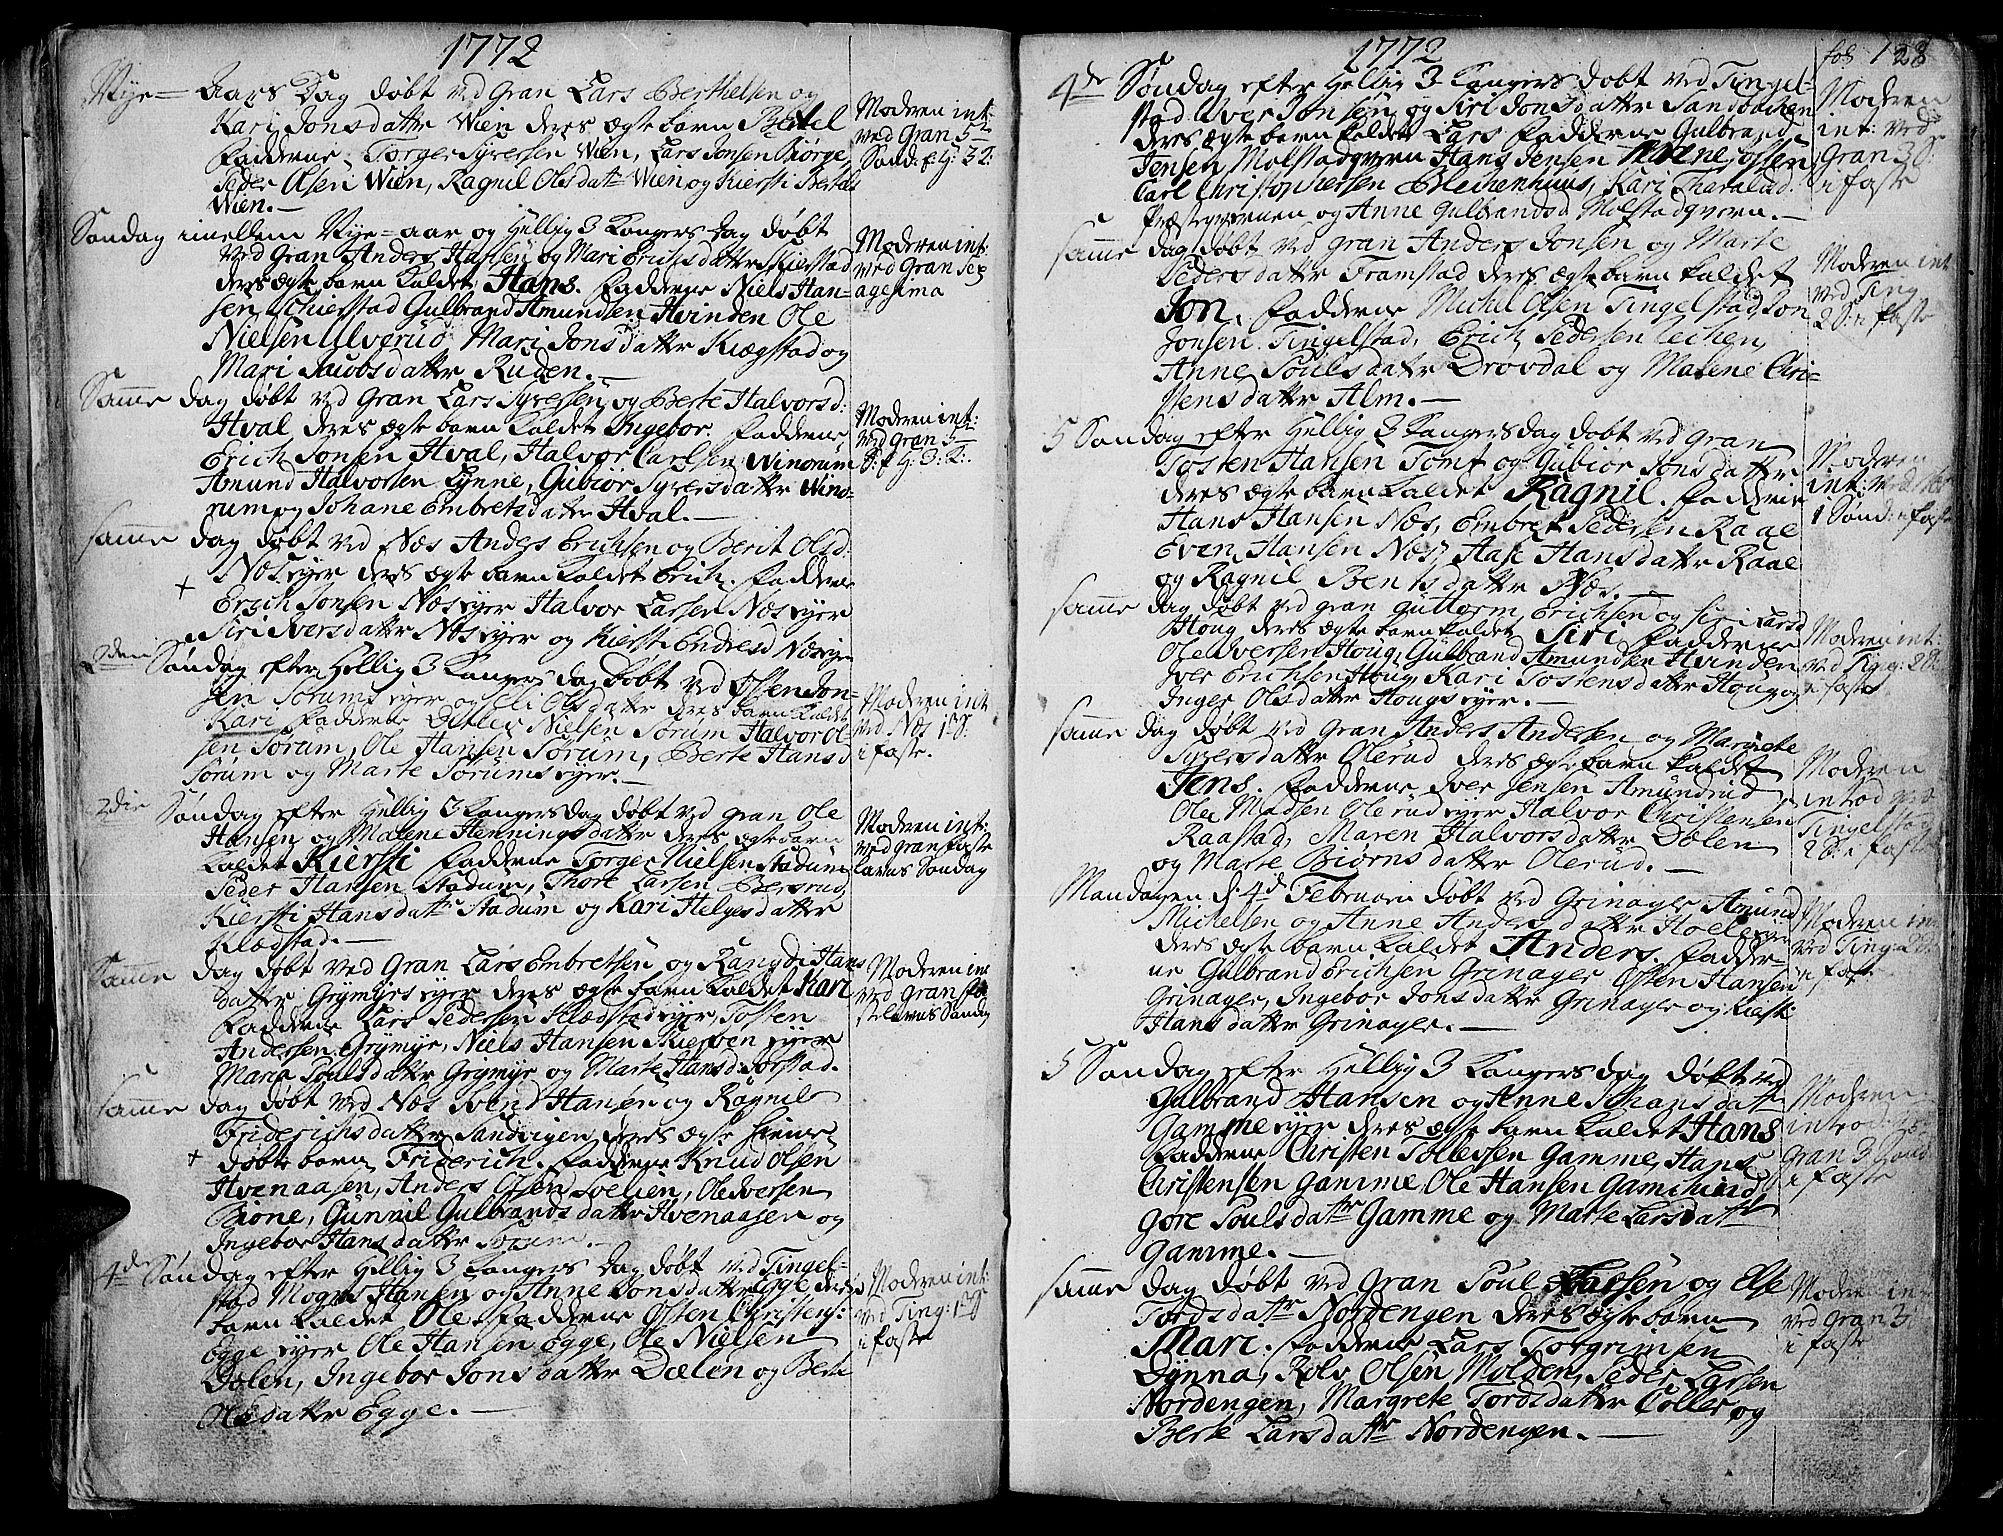 SAH, Gran prestekontor, Ministerialbok nr. 4, 1759-1775, s. 128